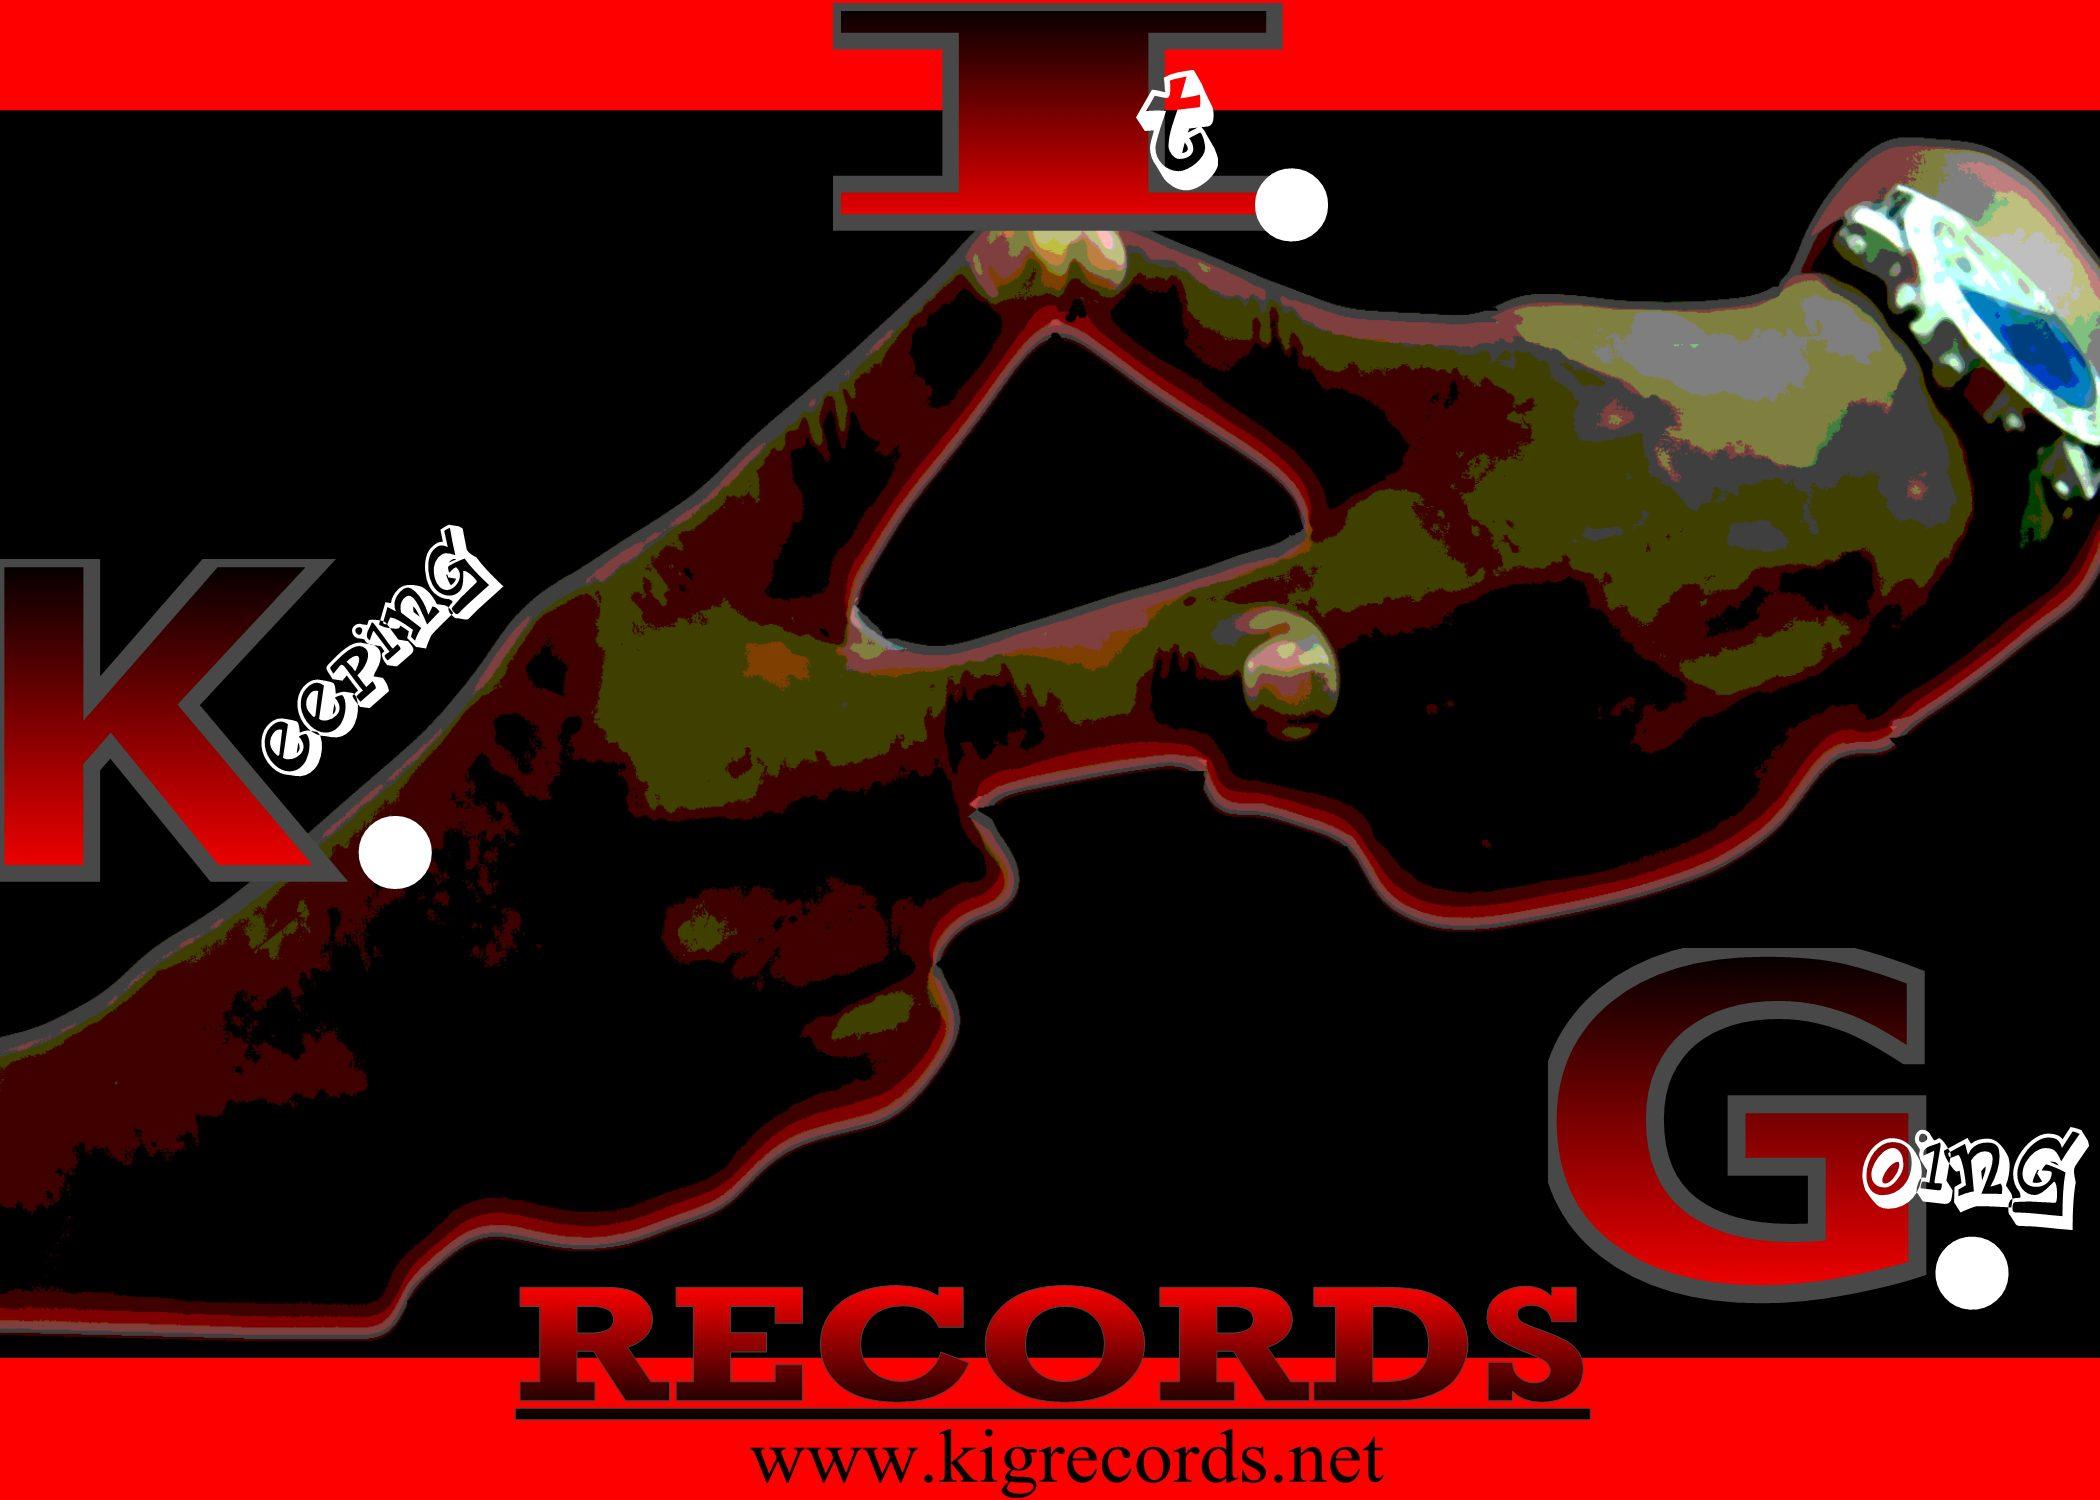 K.I.G. Records & Services